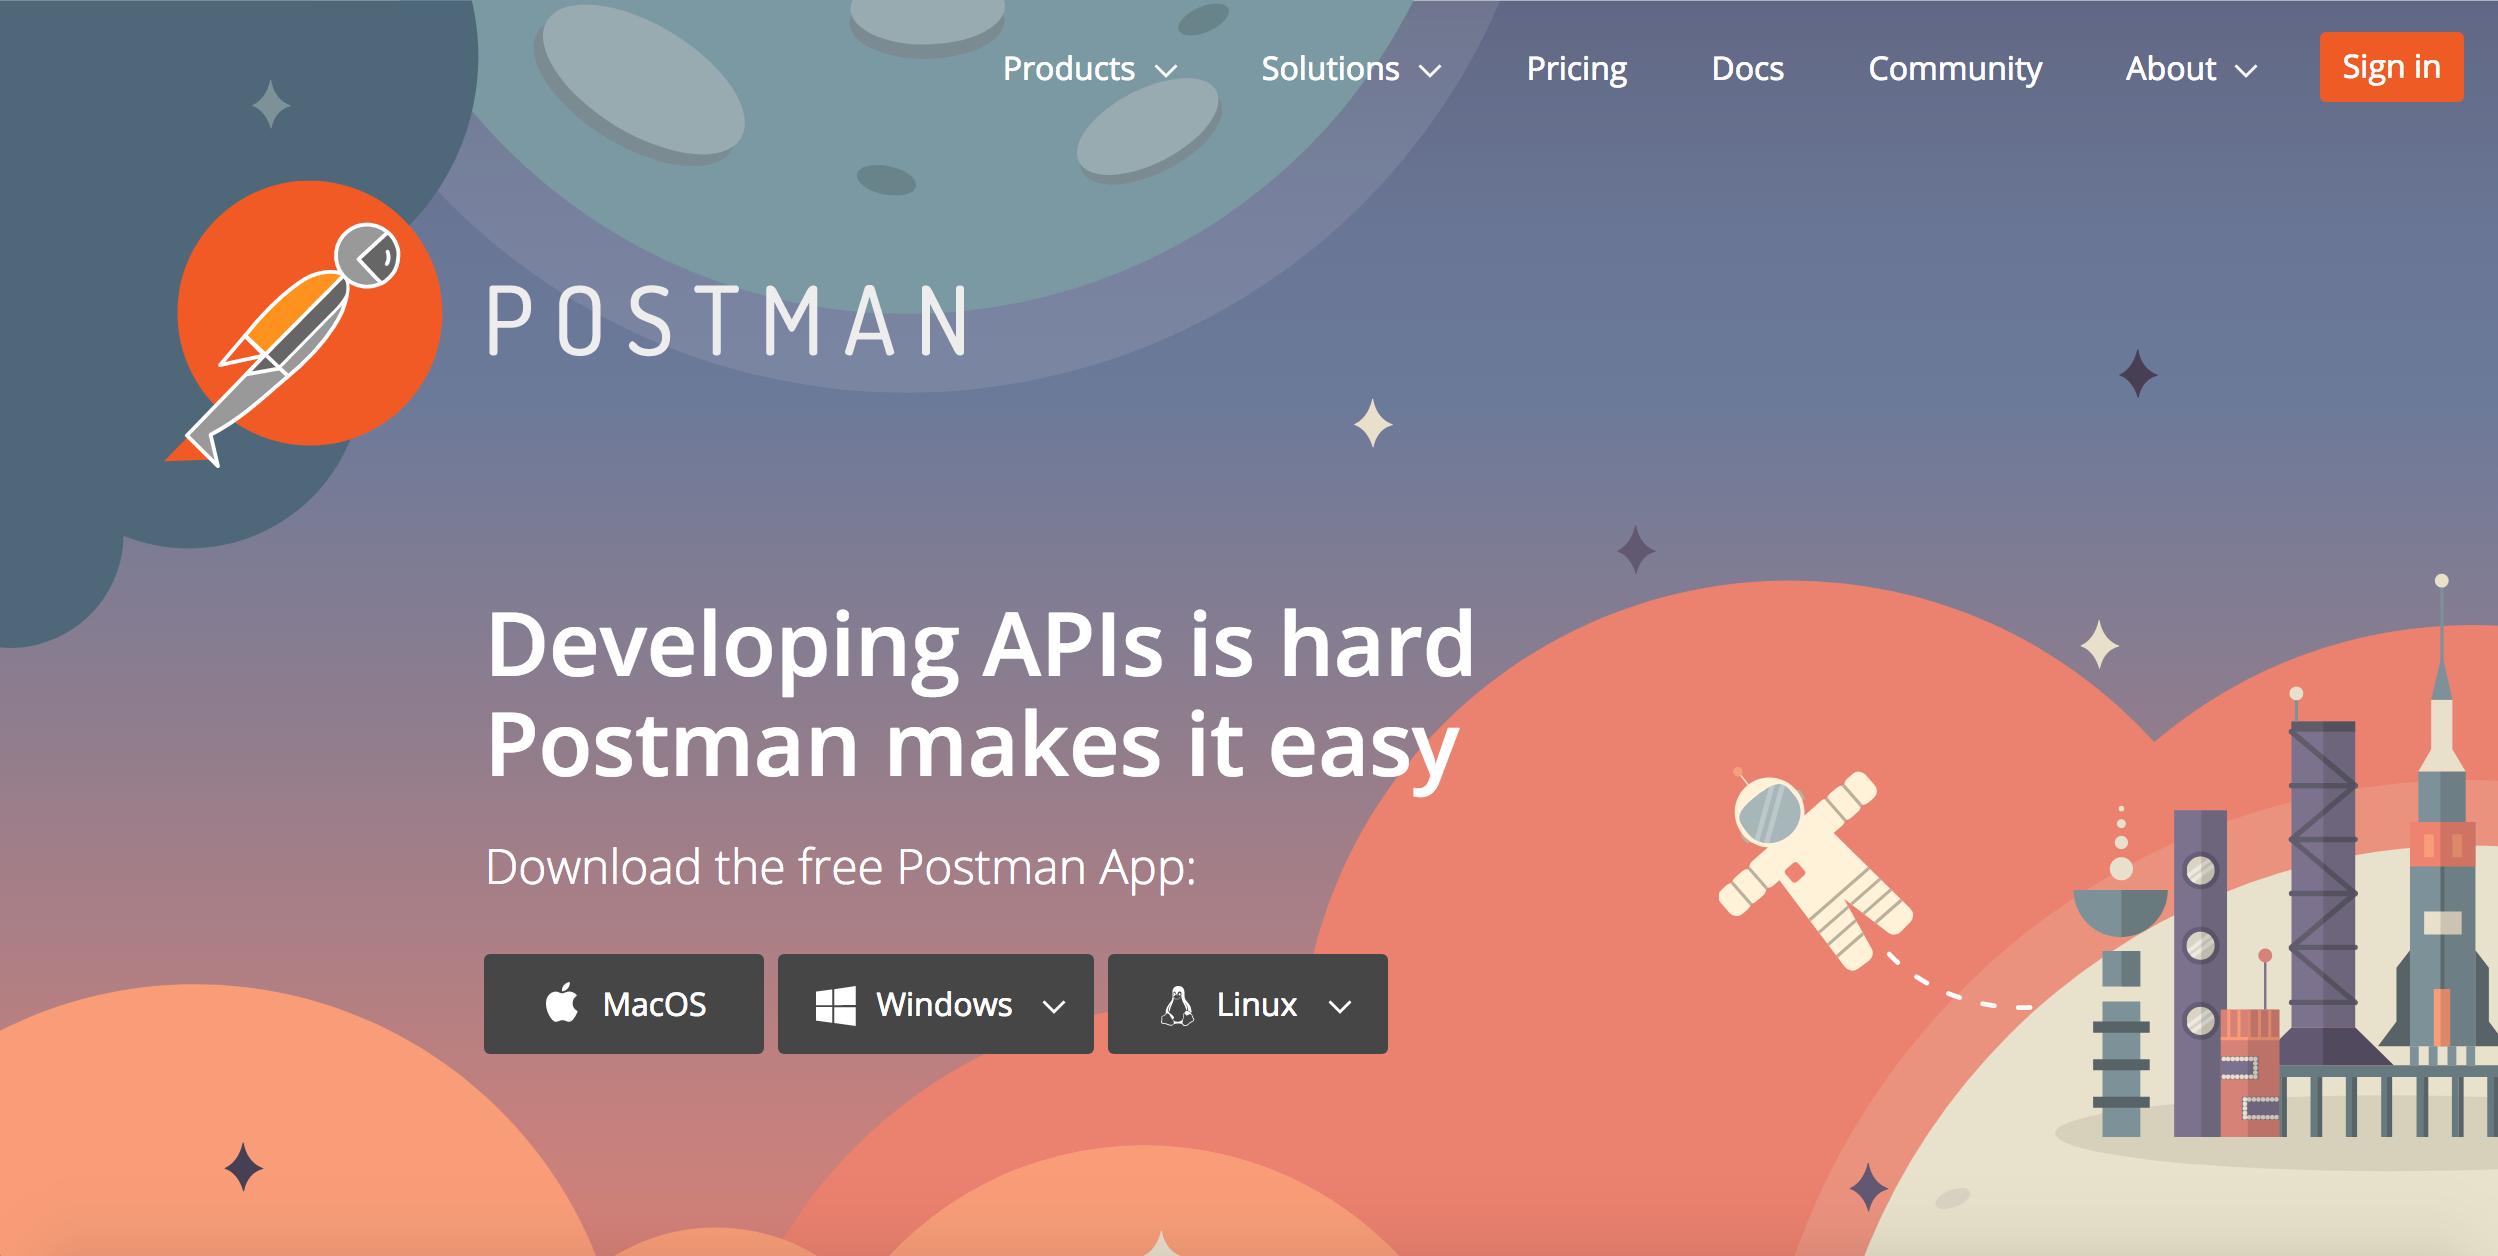 Startup più innovative nel software 2018: Postman